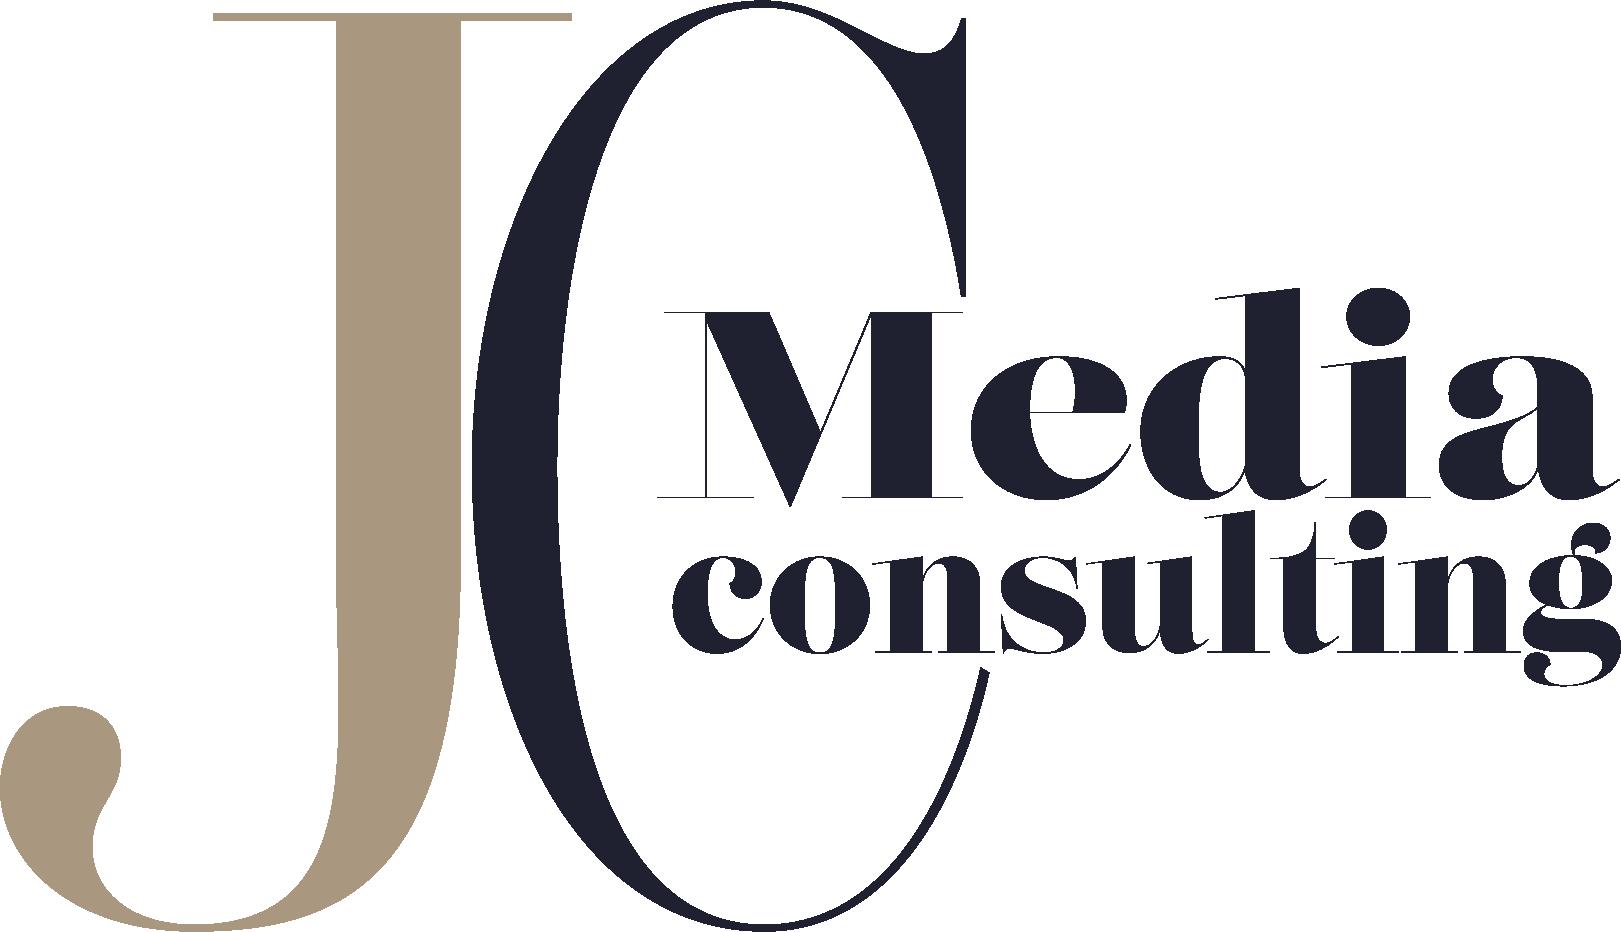 JC Media Consulting